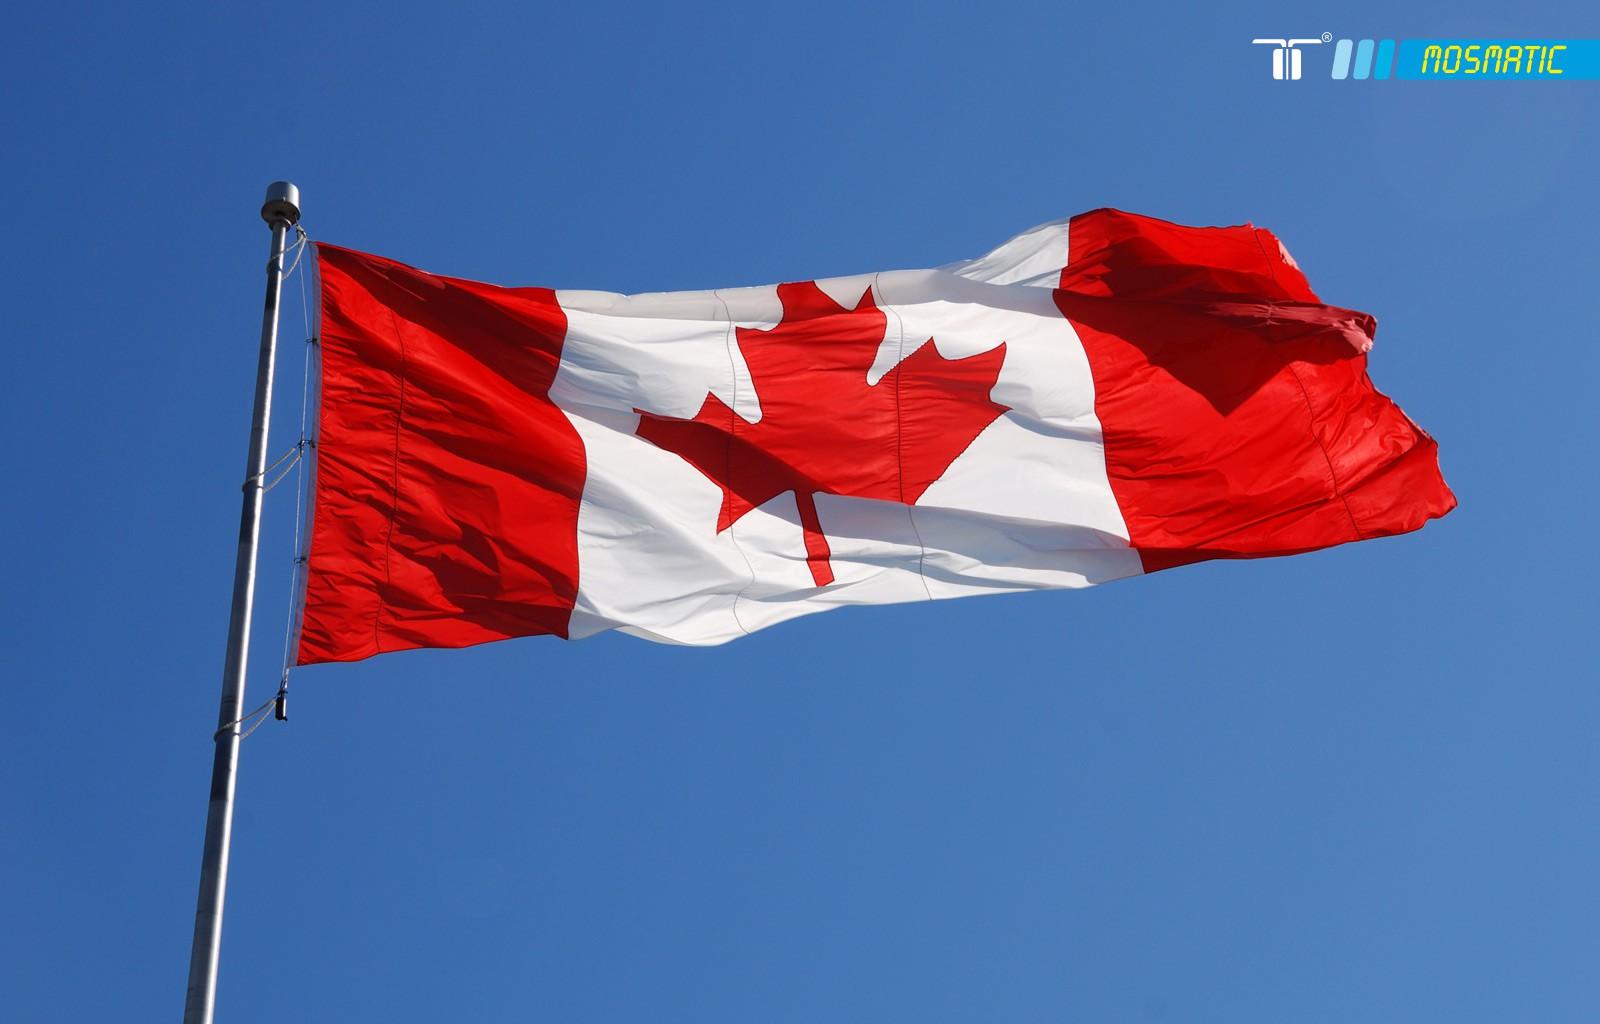 Mosmatic Canada